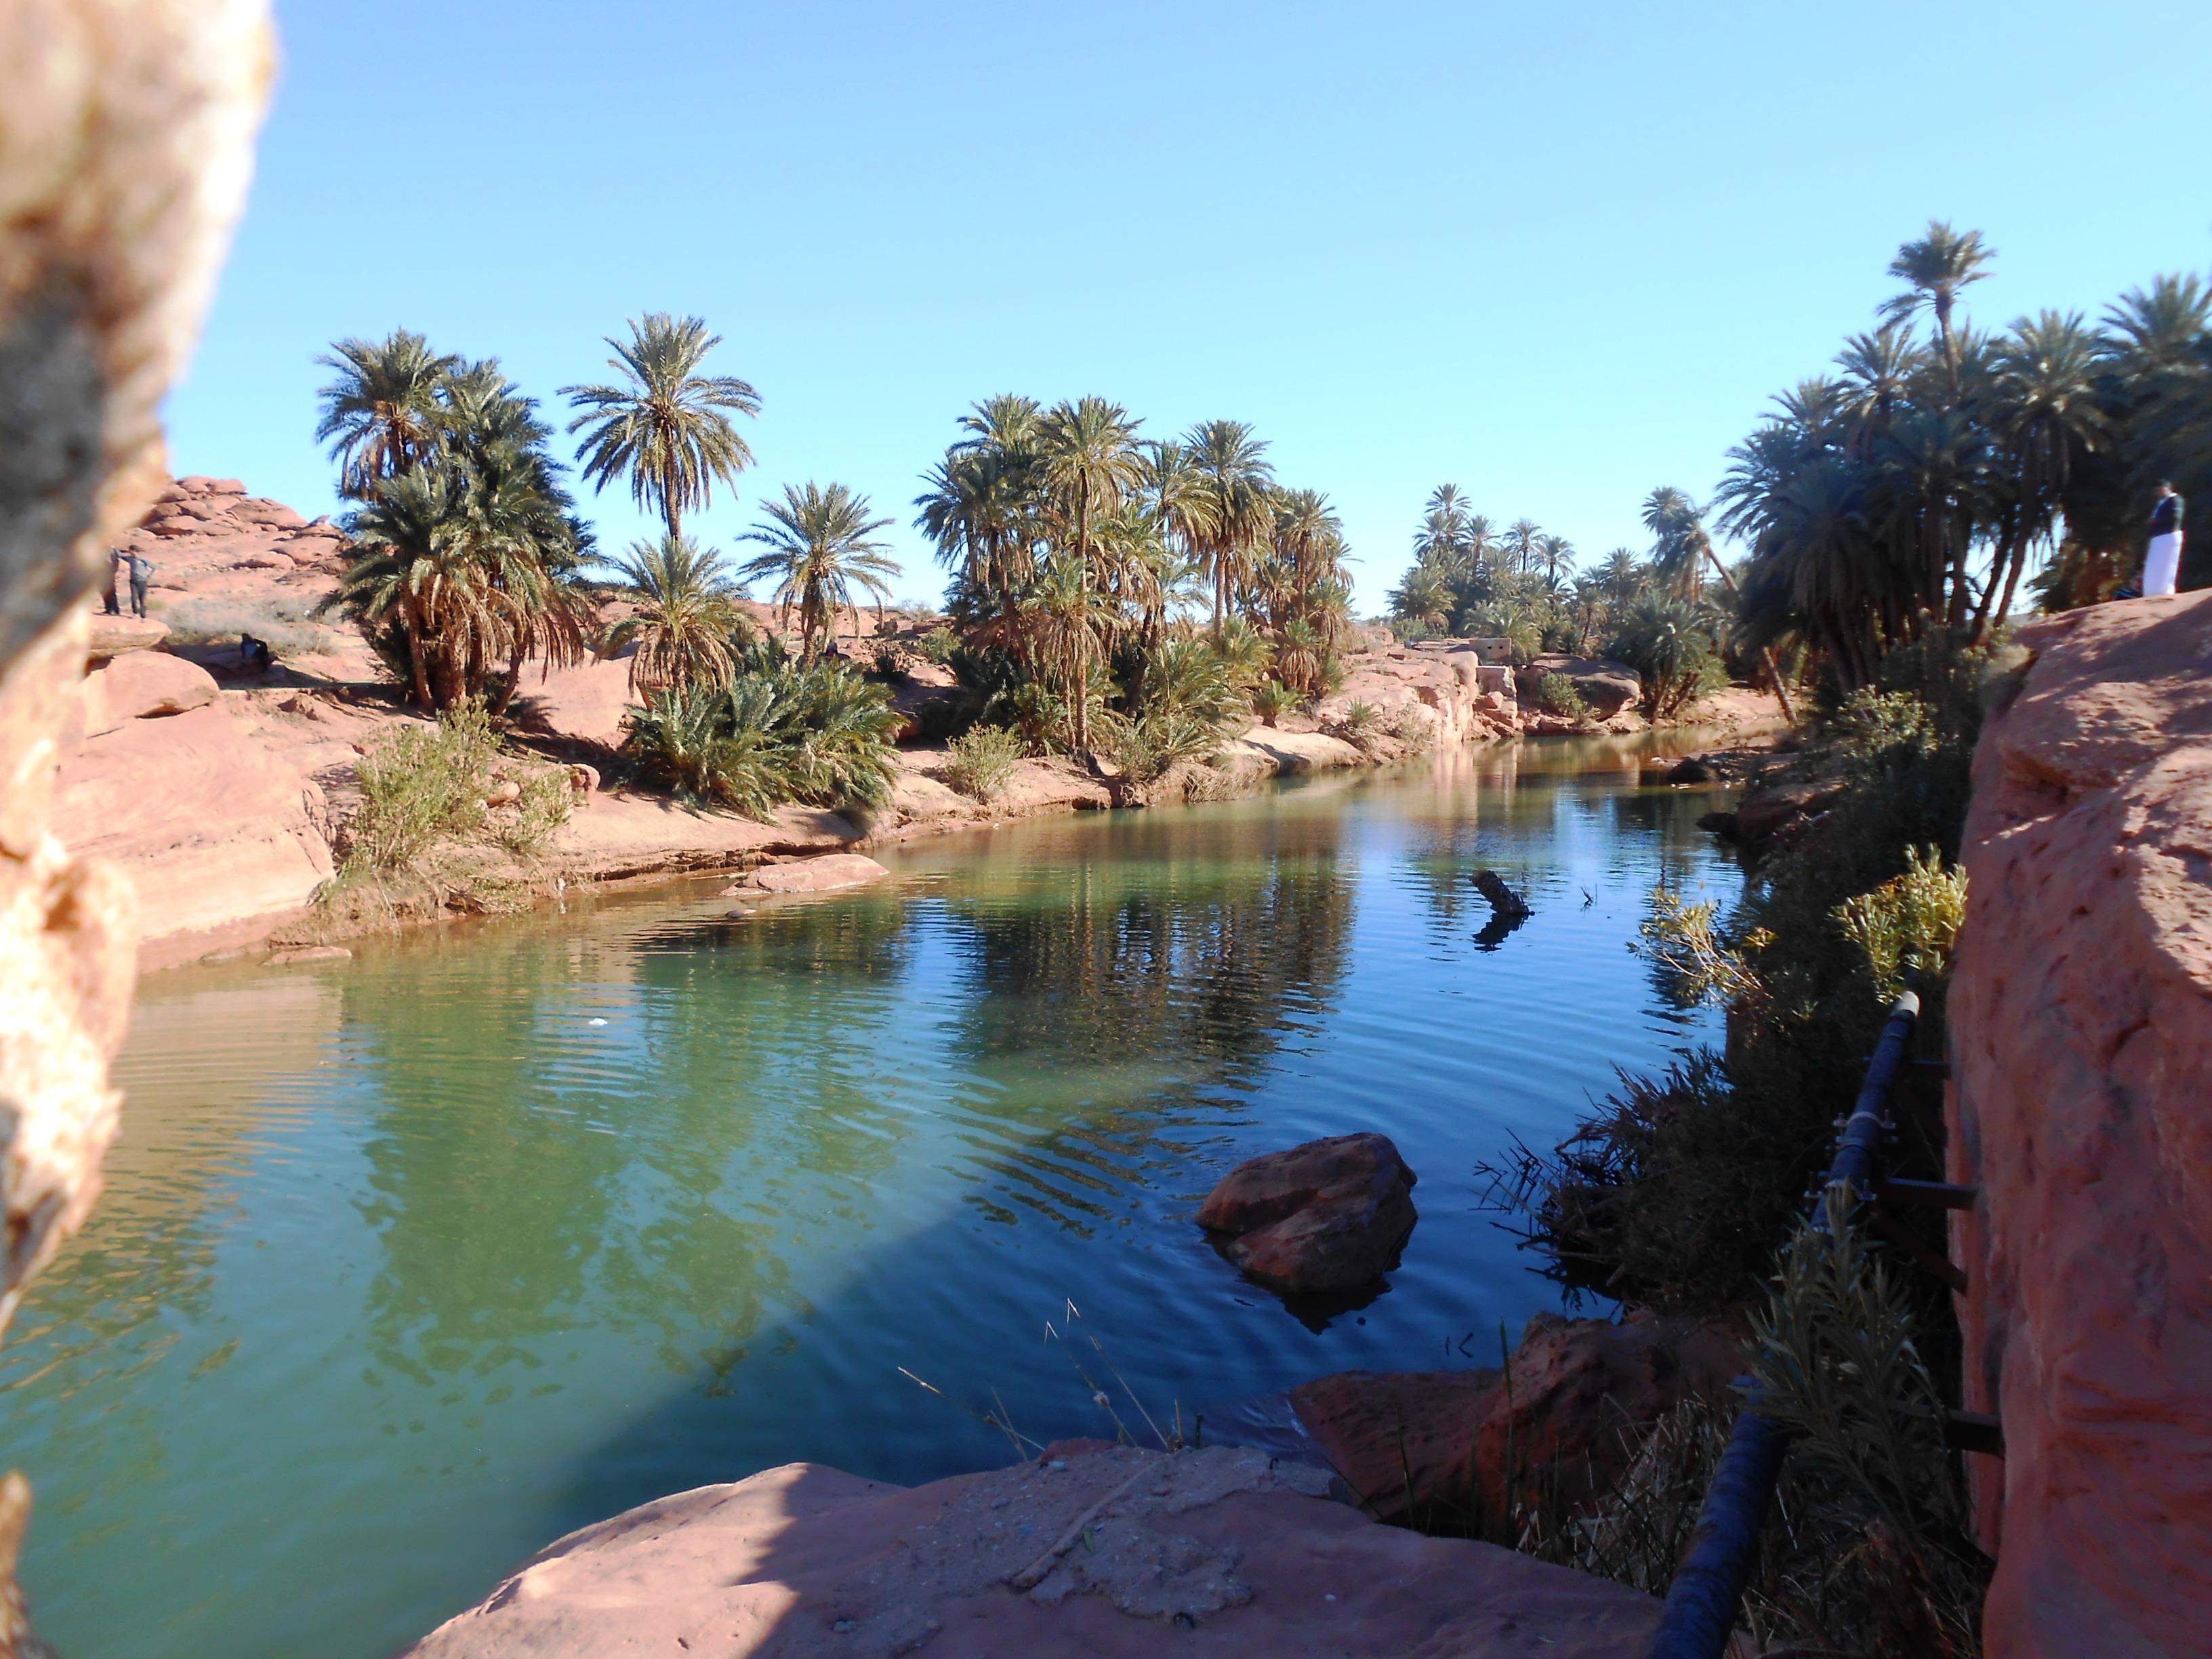 morocco-taroudant-oasis-tiout1532022751.JPG